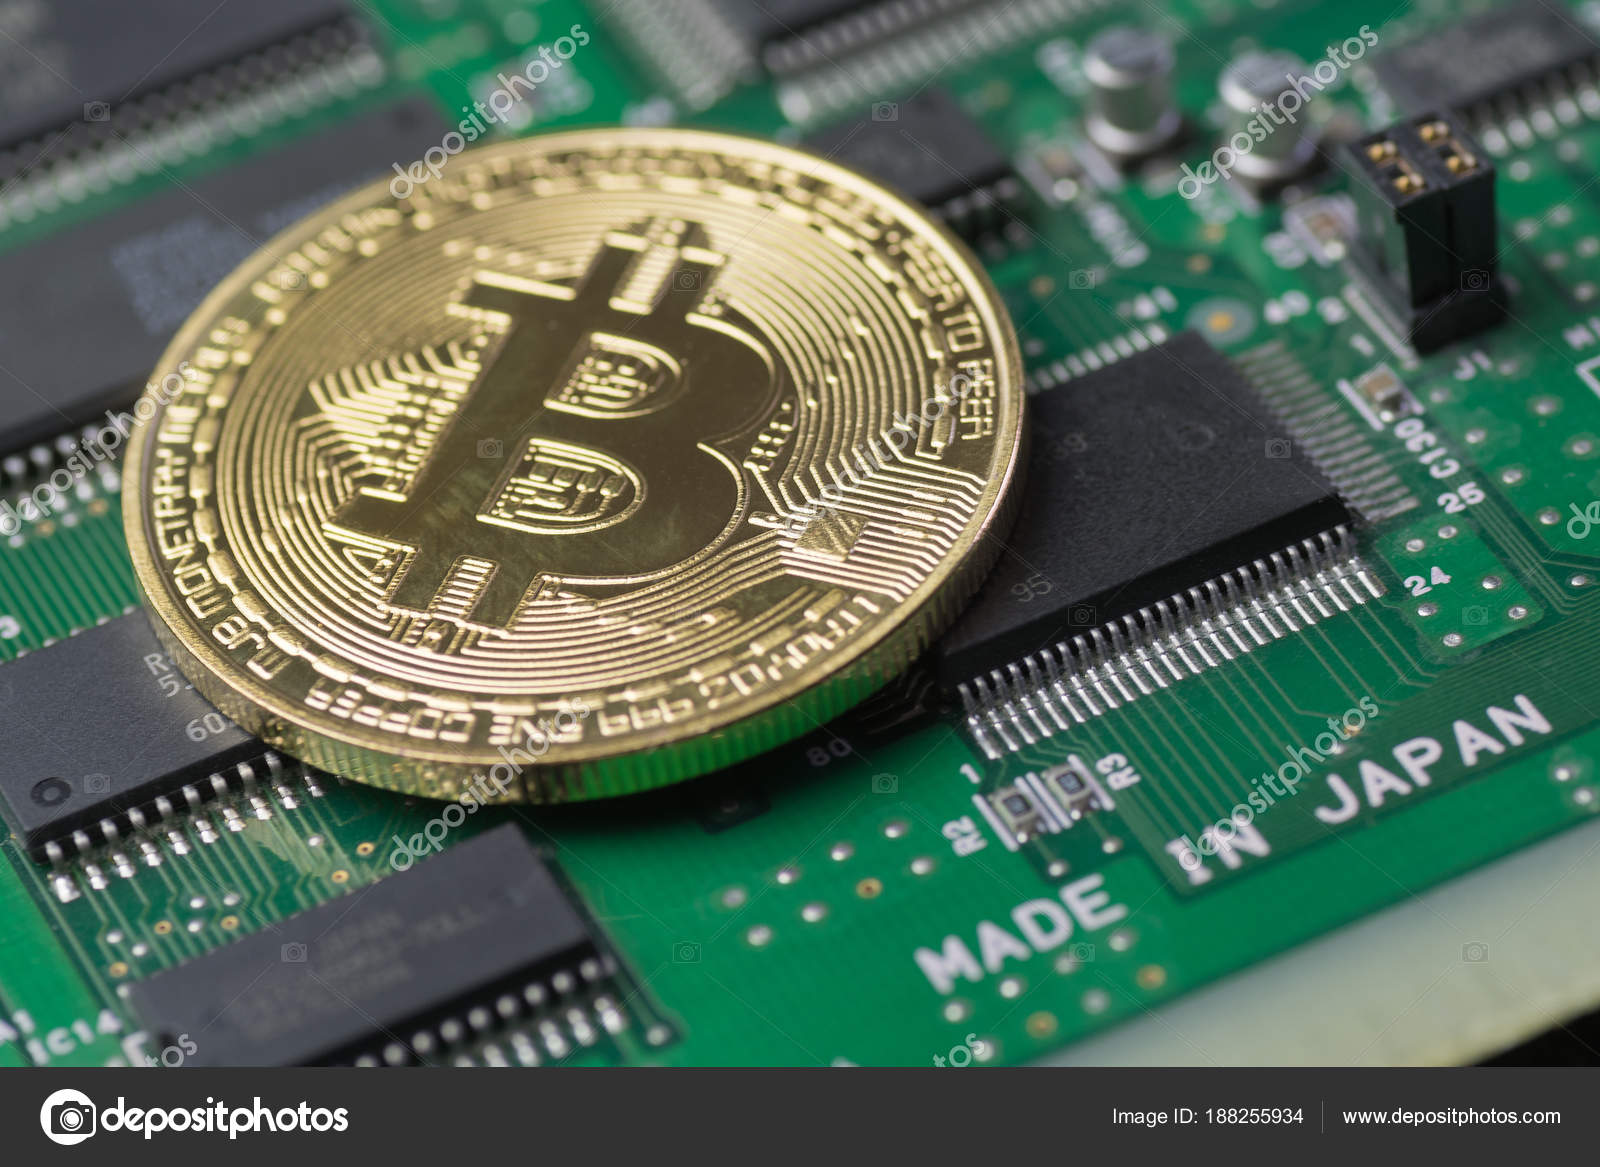 Circuito Japon : Bitcoin oro en placa de circuito impreso con microchips en japón